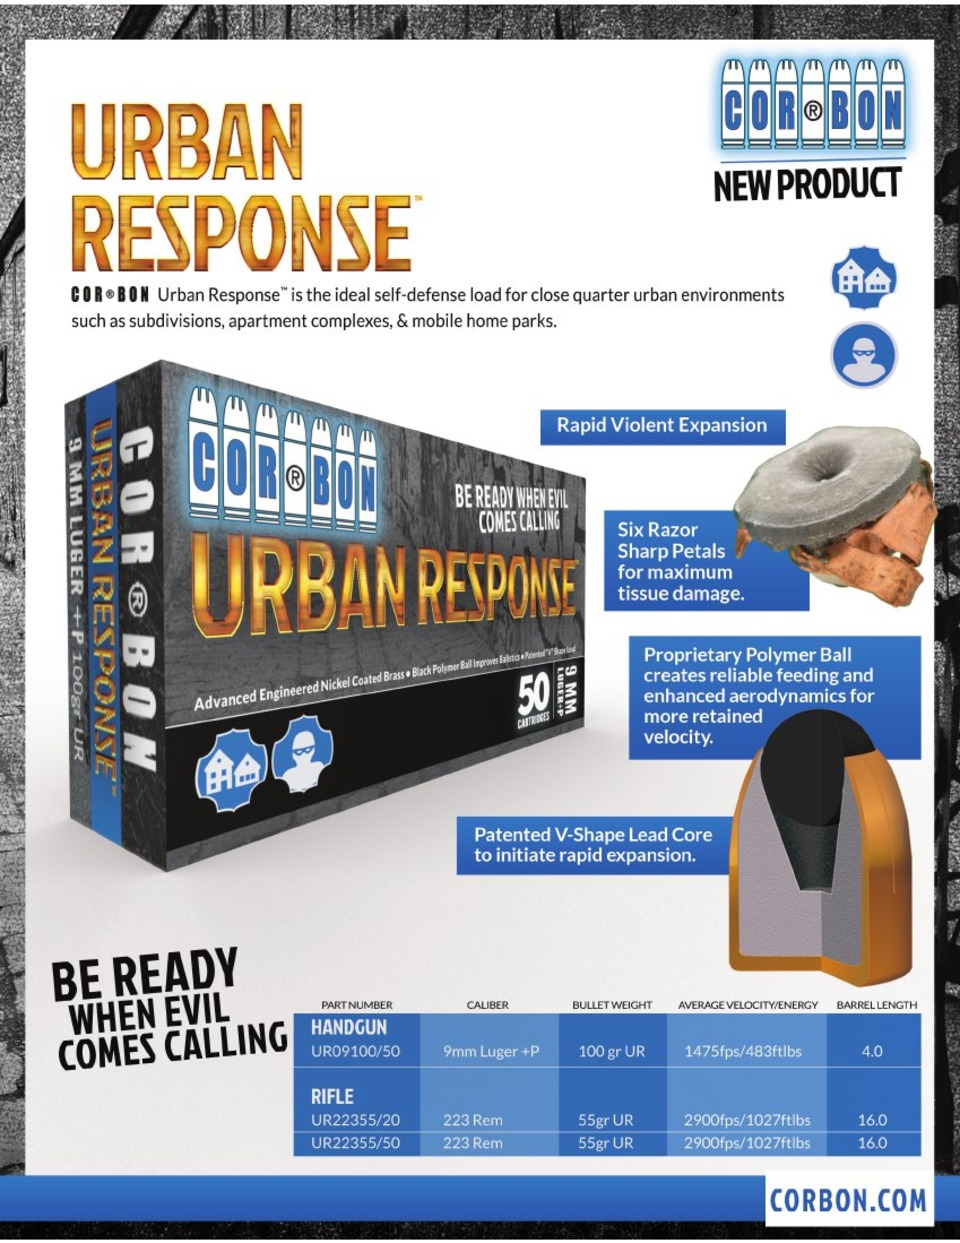 COR®BON AMMUNITION ANNOUNCES ITS NEW URBAN RESPONSE™ PISTOL